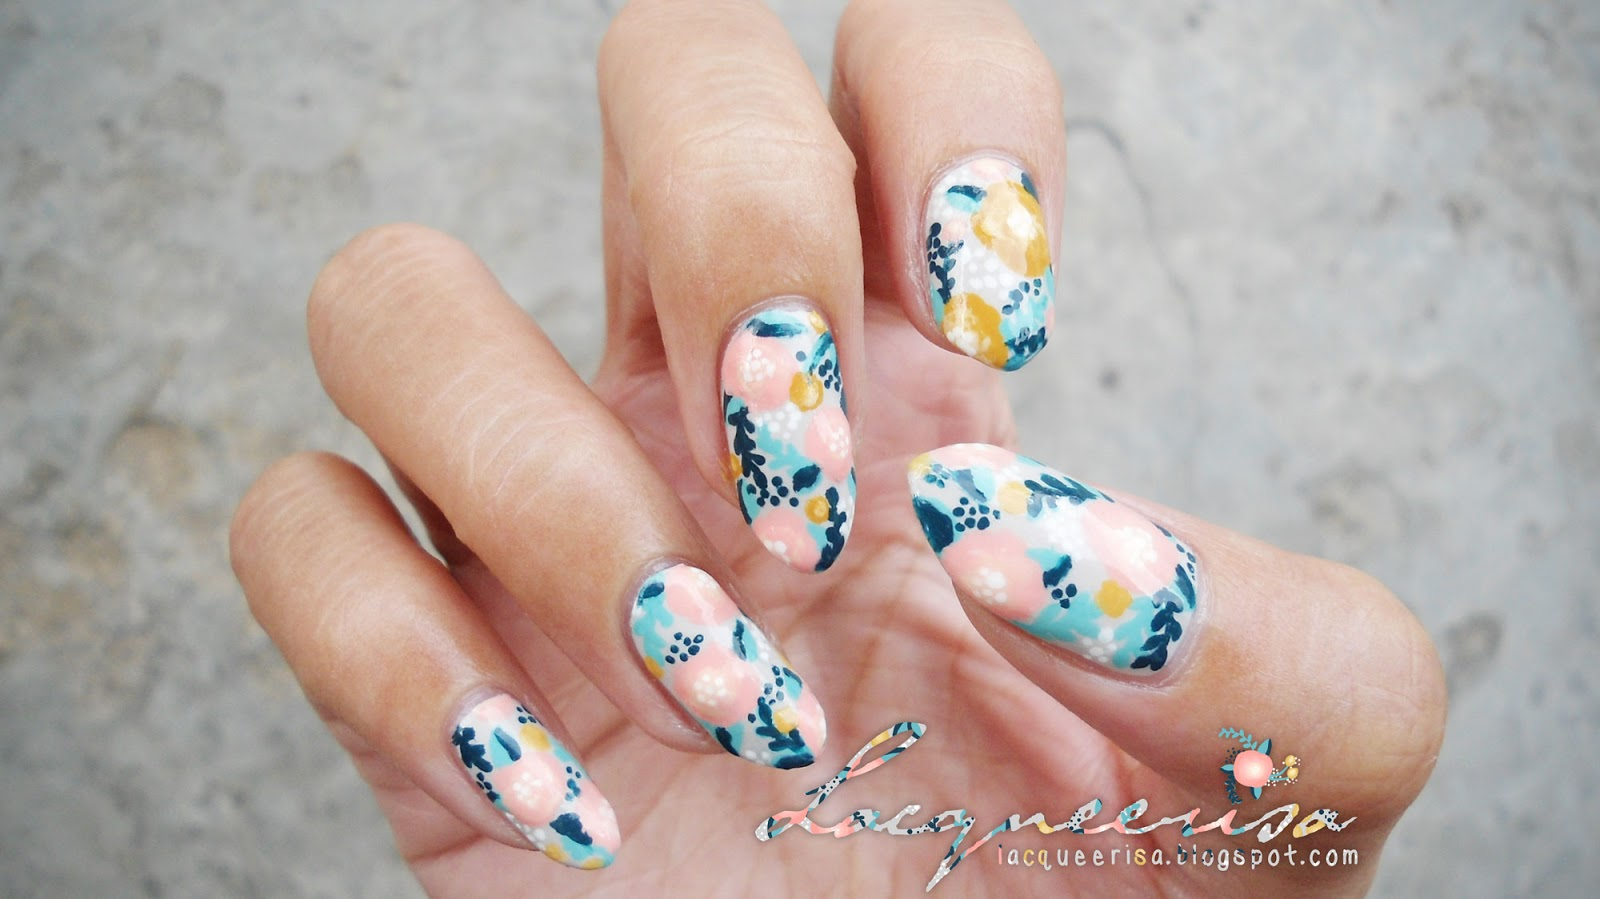 Lacqueerisa: Creamy Dreamy Floral Nails